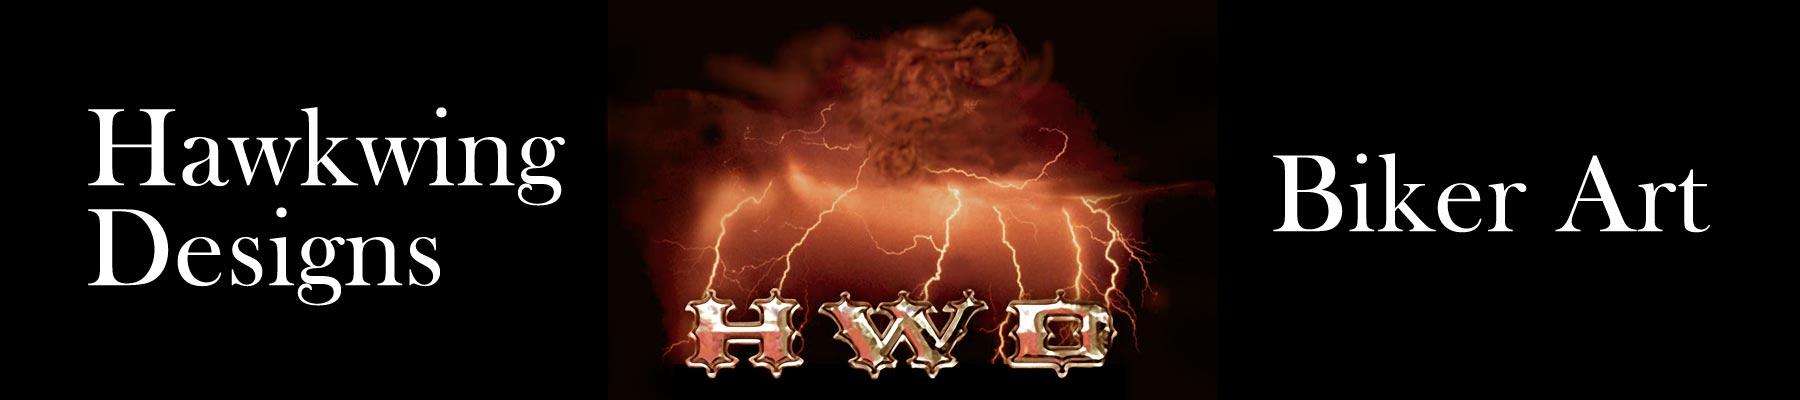 Hawkwing Designs